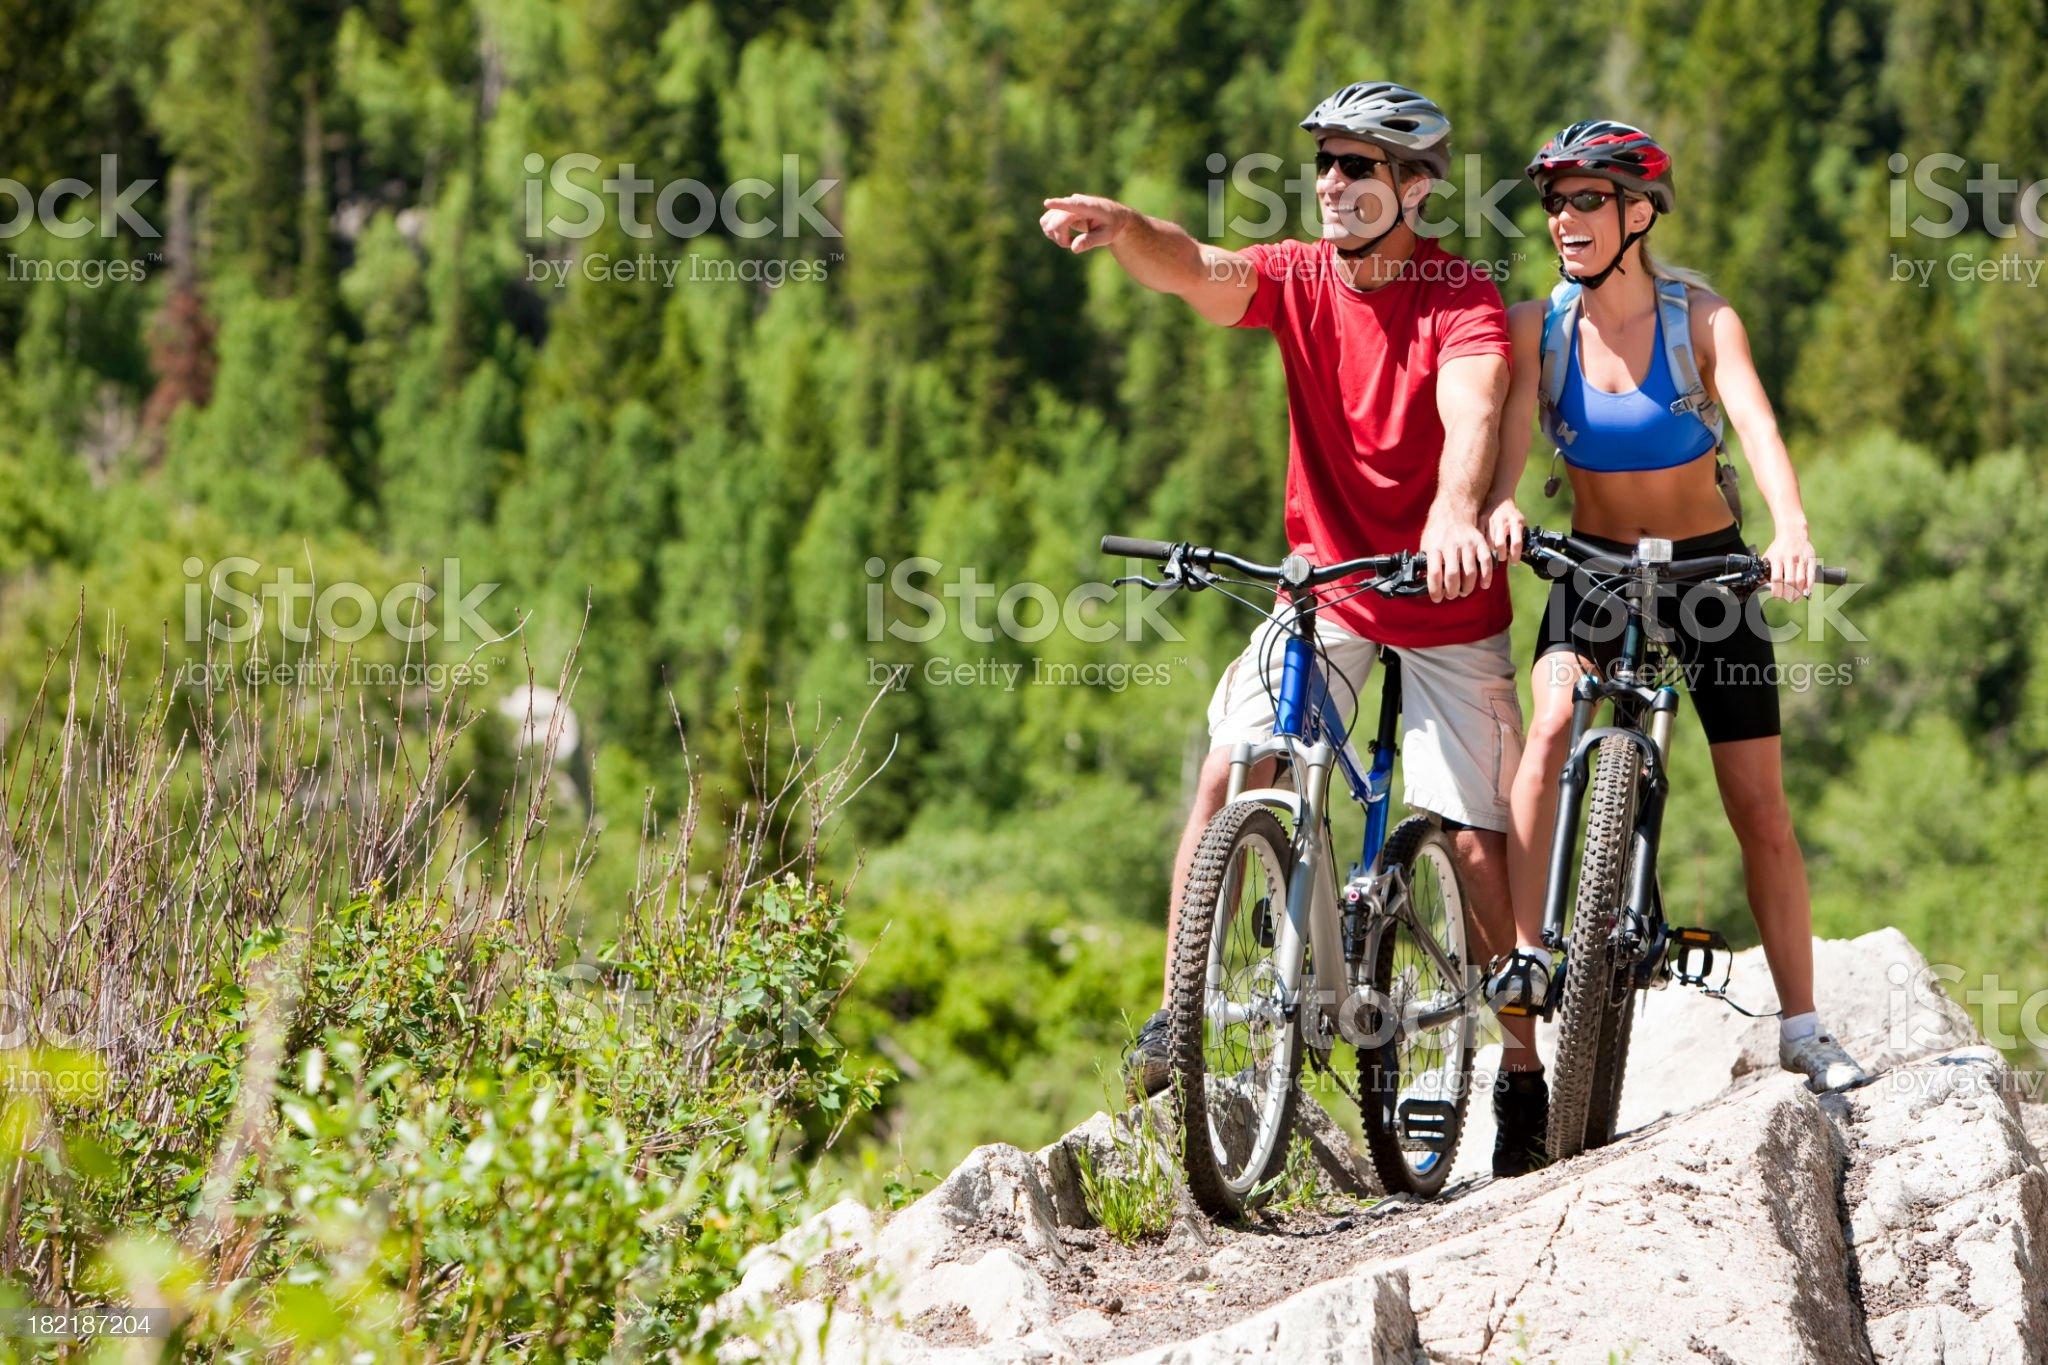 Happy Couple Mountain Biking Together royalty-free stock photo